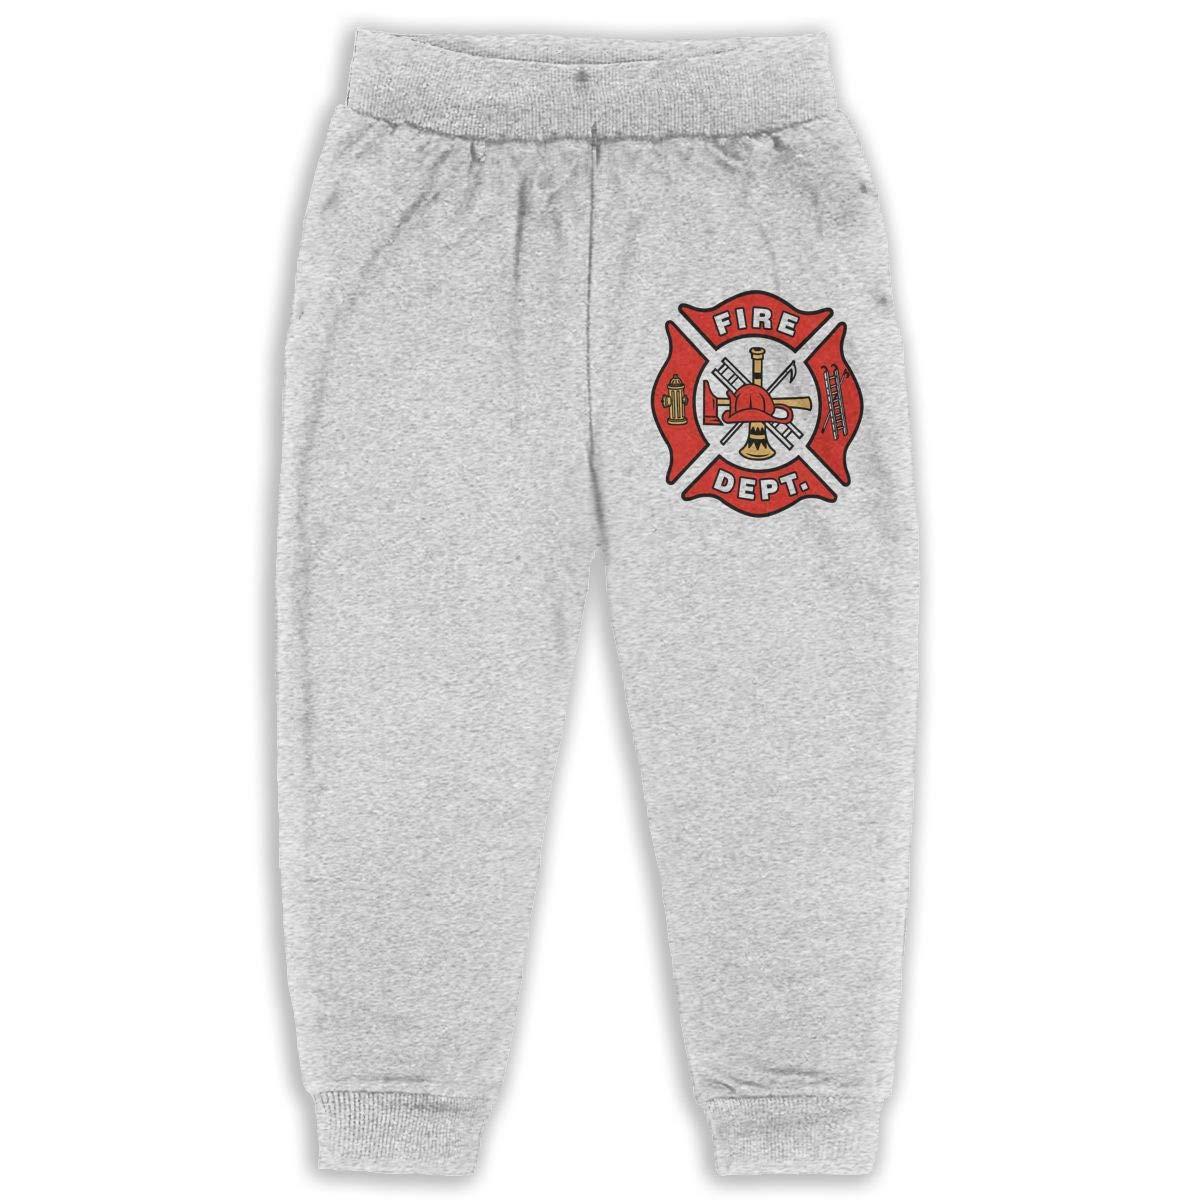 NEST-Homer Childrens Sweatpants US Fire Department Logo Boys and Girls Jogger Long Pants Sweatpants Leggings